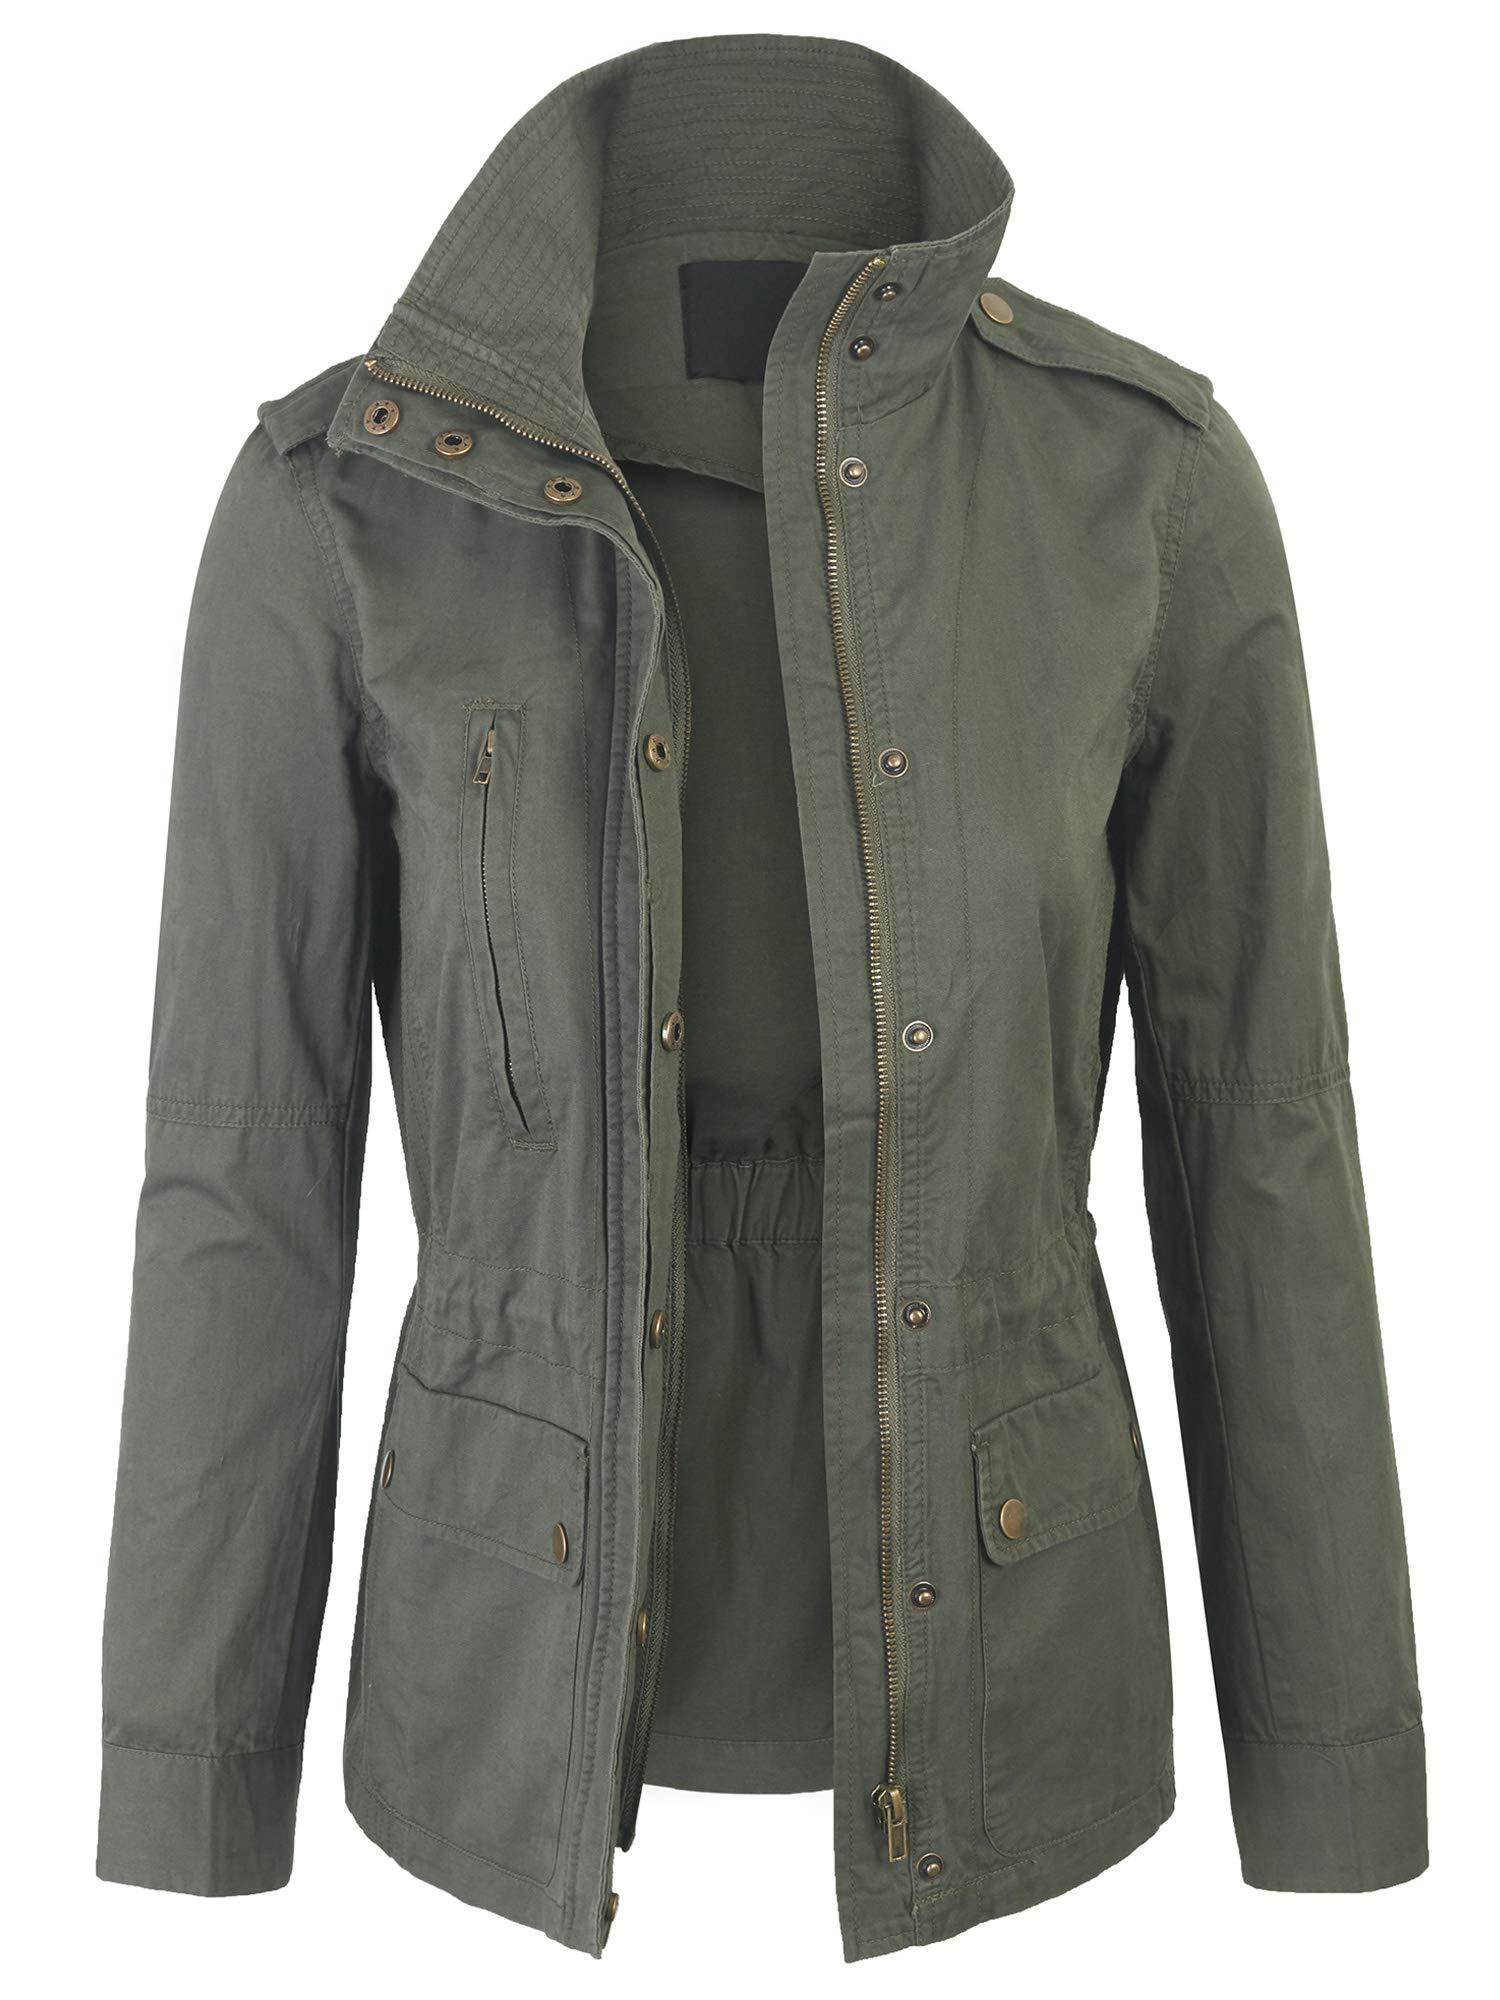 KOGMO Womens Zip Up Military Anorak Safari Jacket Coat -XL-Olive by KOGMO